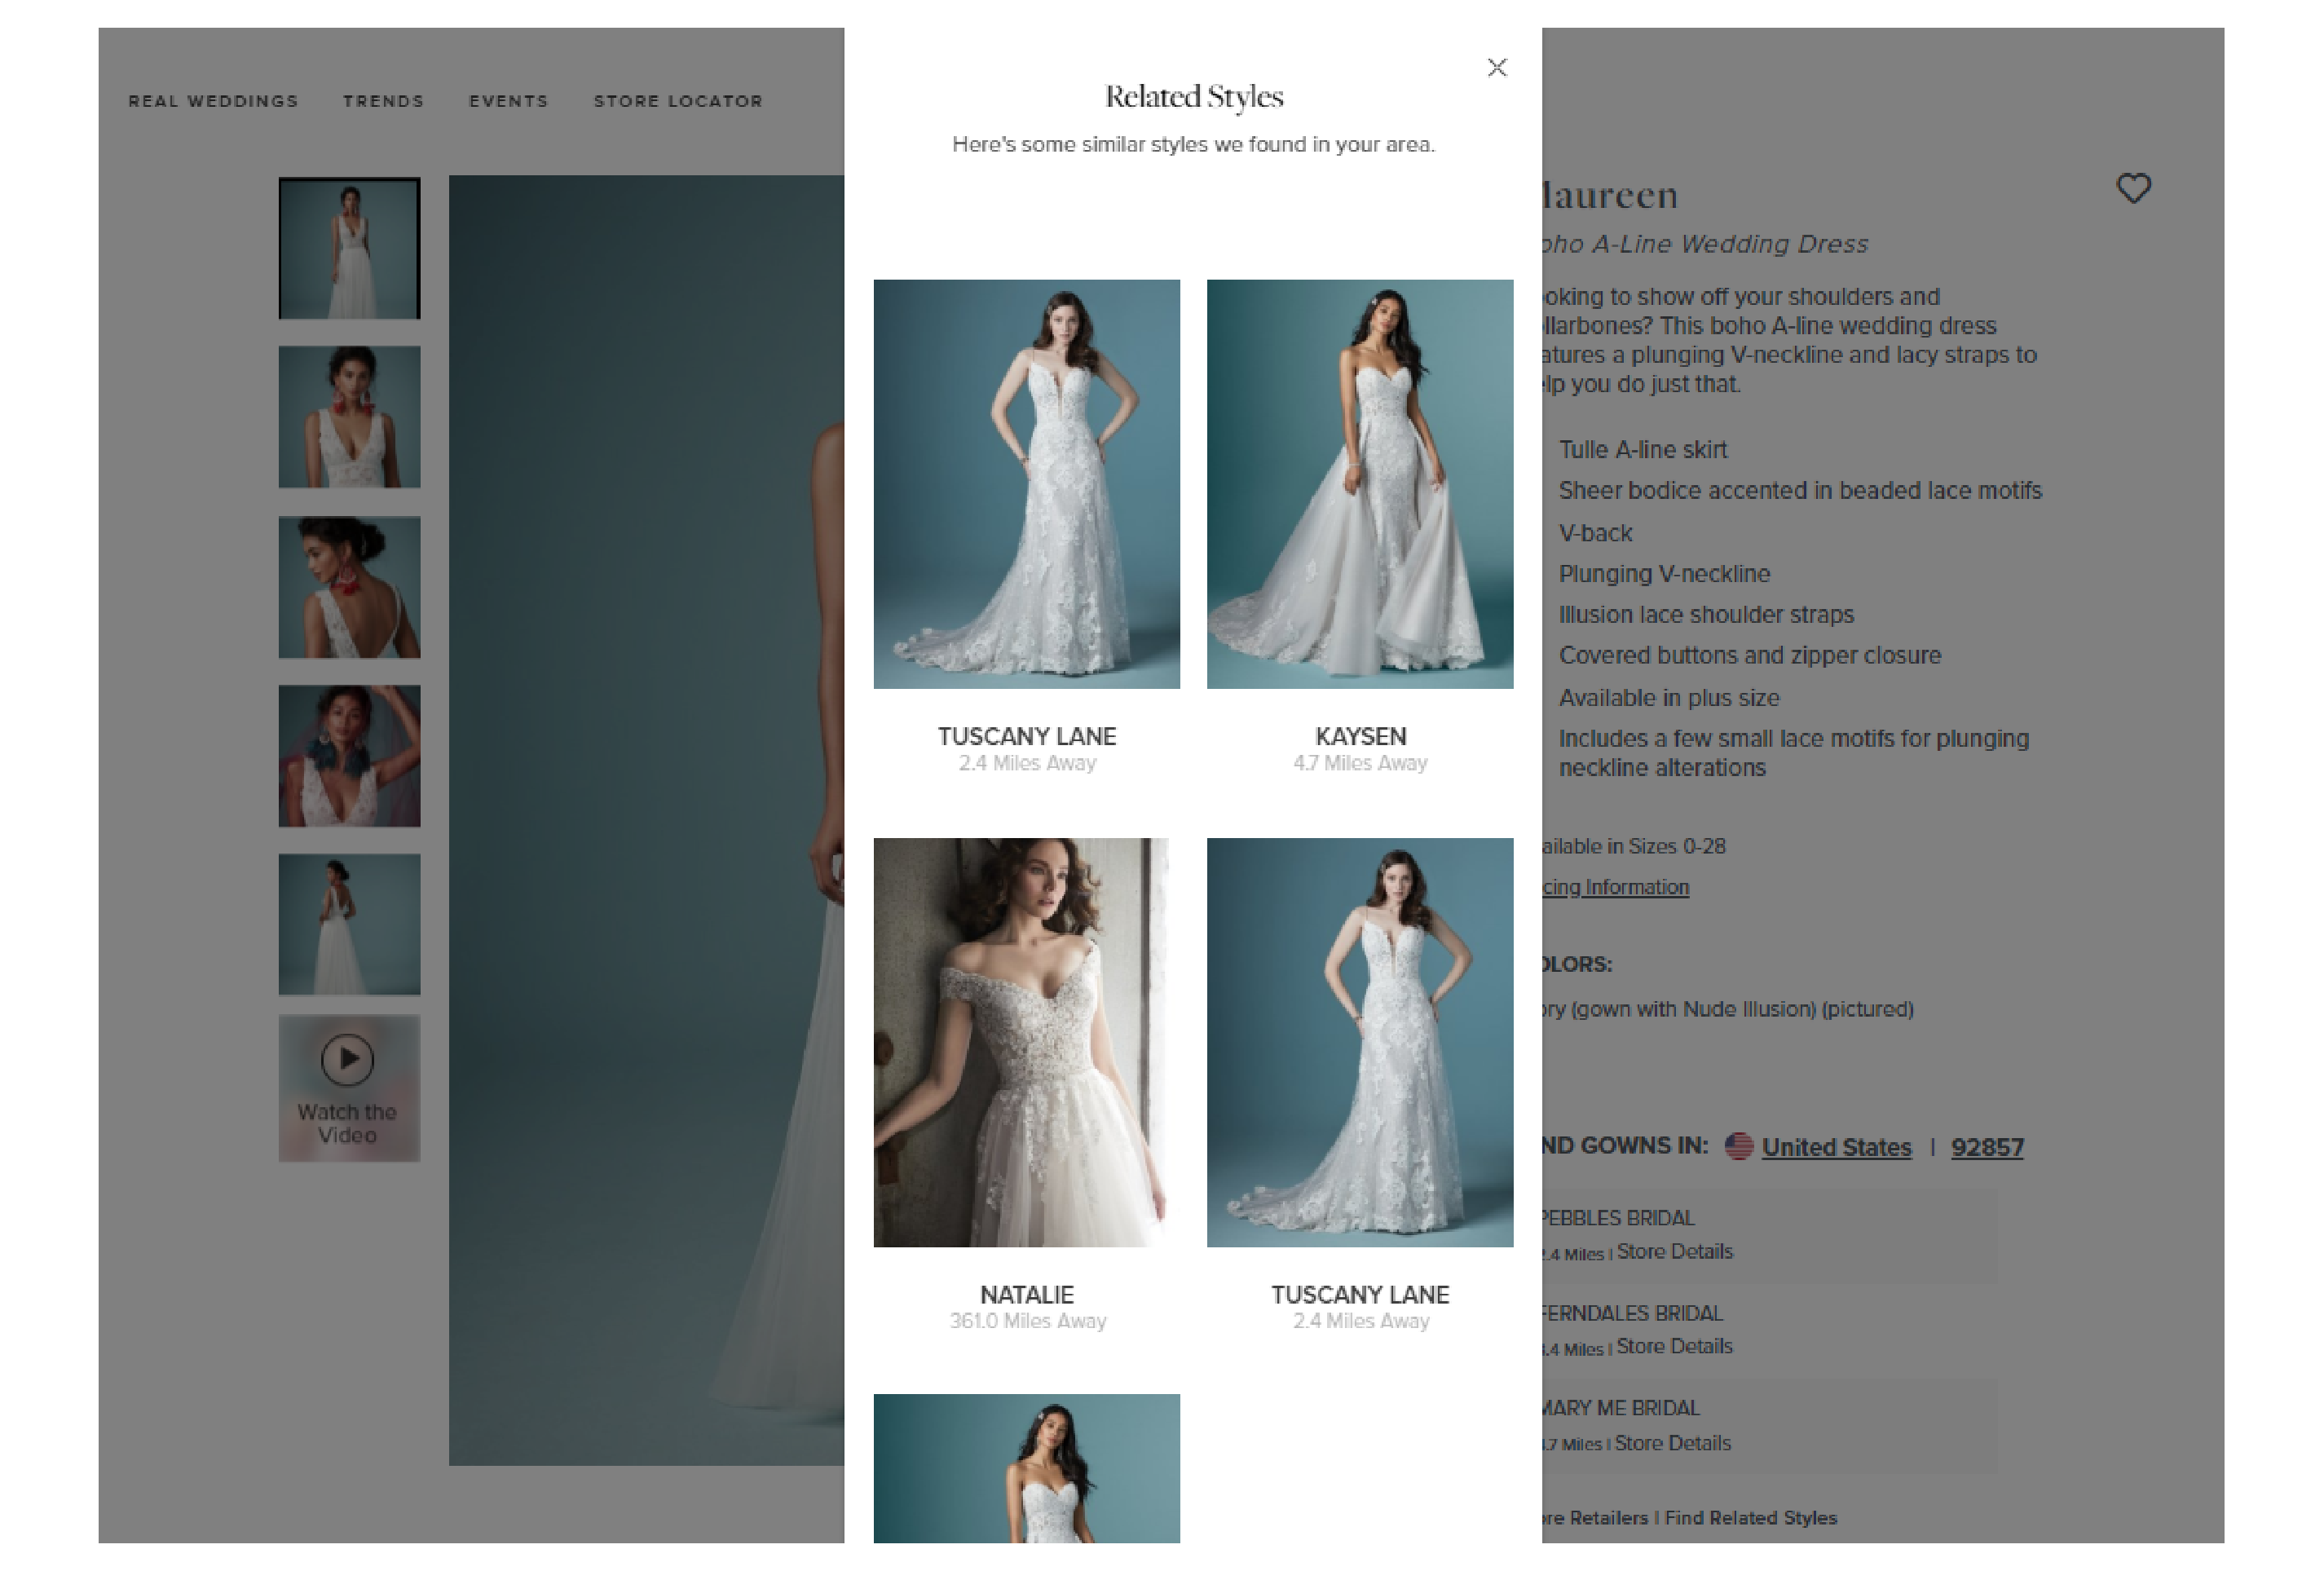 Related Styles Screenshot